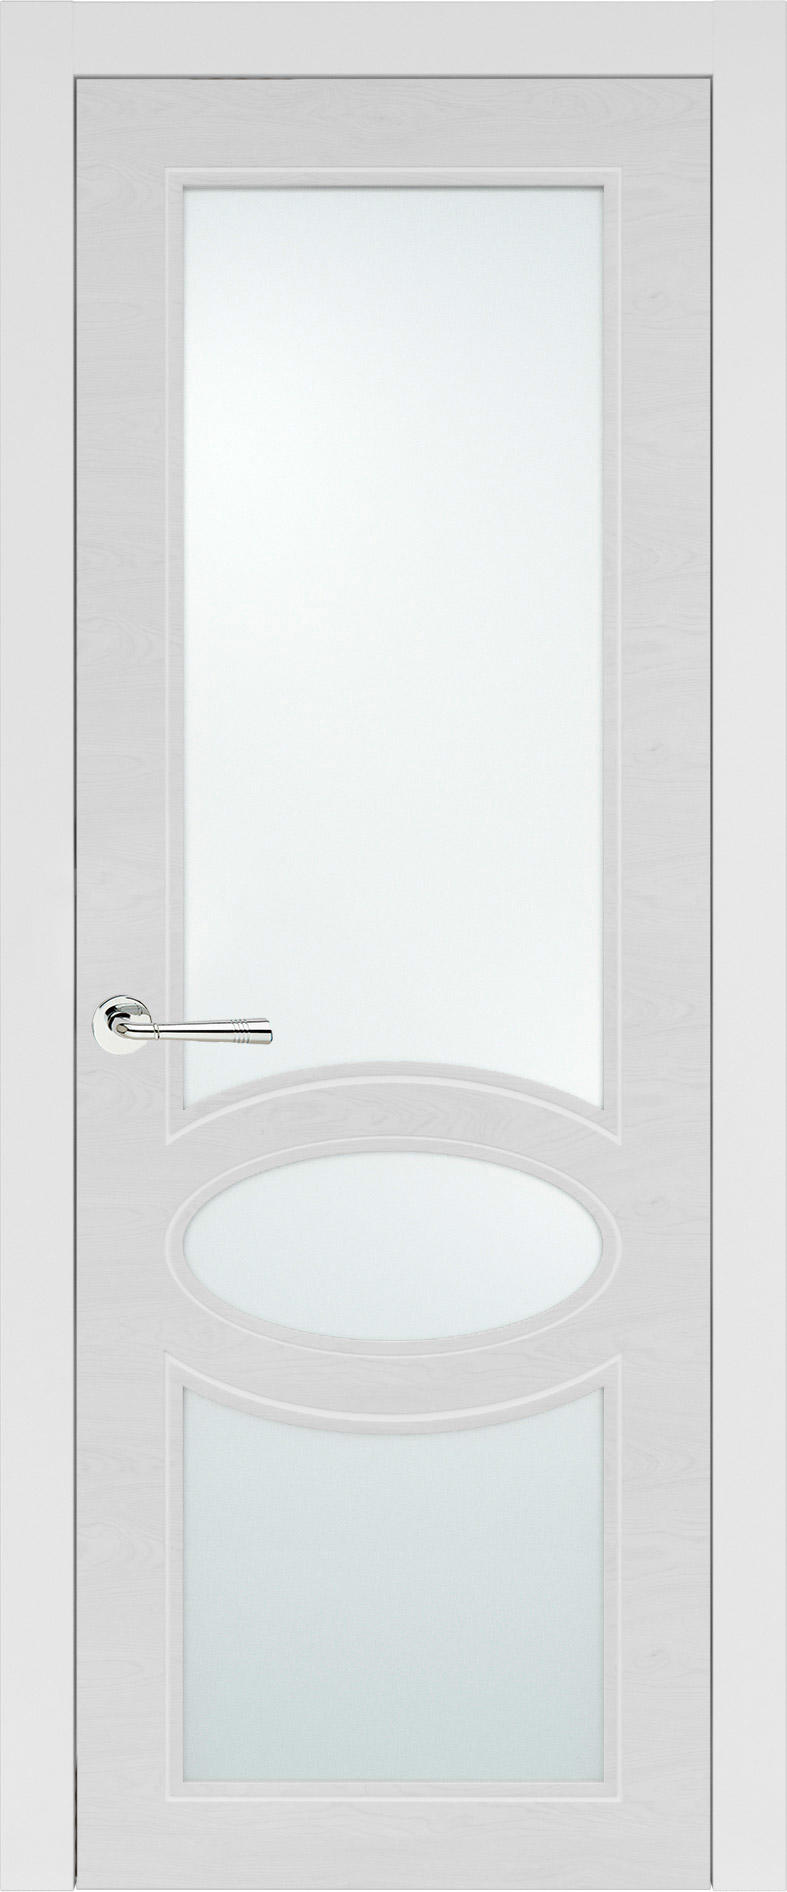 Florencia Neo Classic цвет - Белая эмаль по шпону (RAL 9003) Со стеклом (ДО)